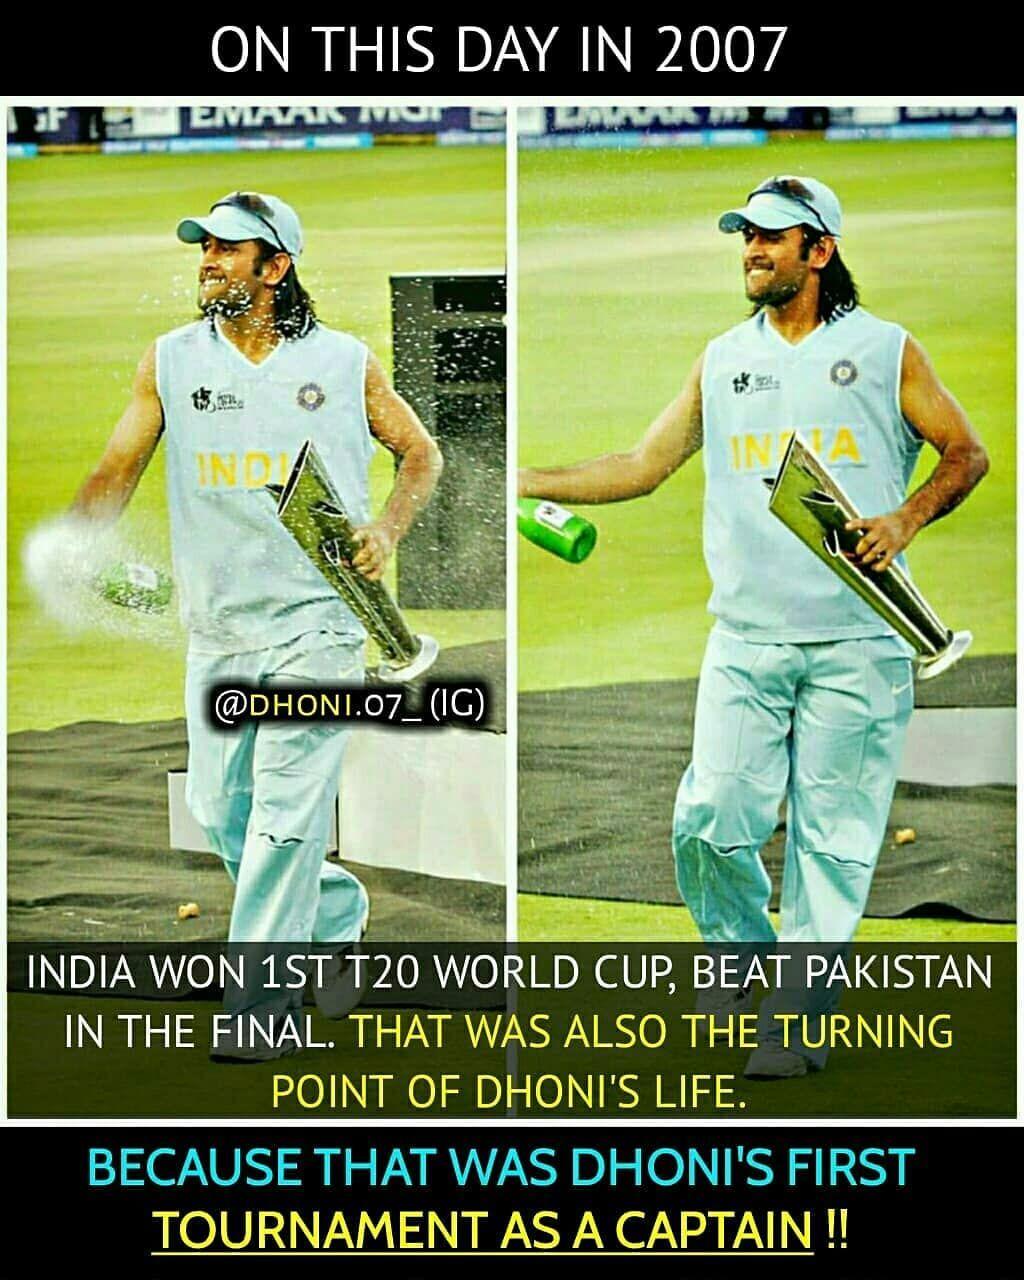 Pin By Harshita Prajapati On Watch Live Cricket Online Live Cricket Streaming Cricket Streaming Watch Live Cricket